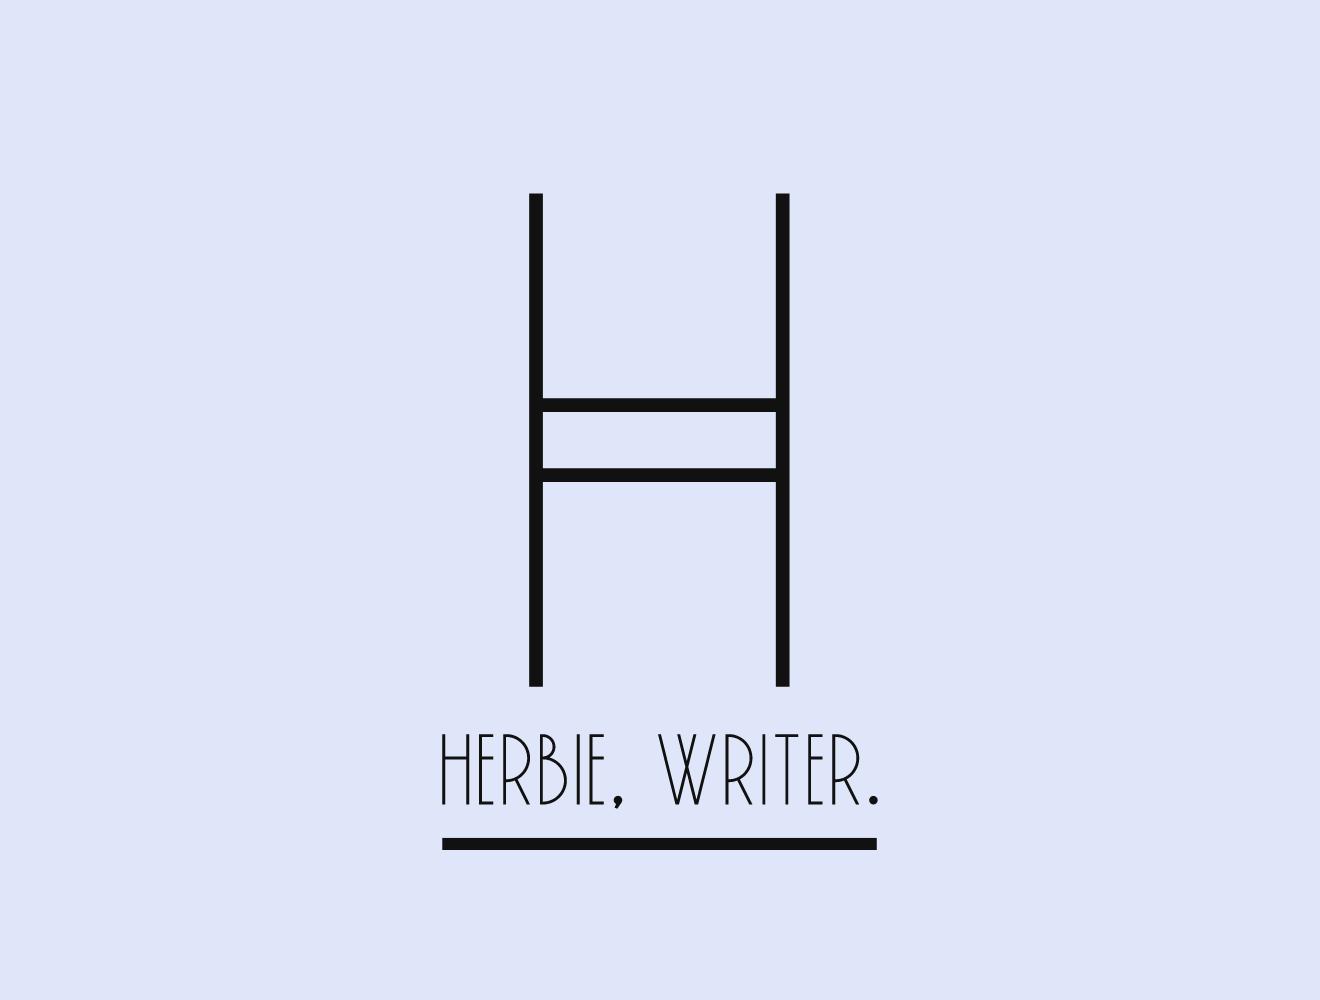 Herbie, Writer.